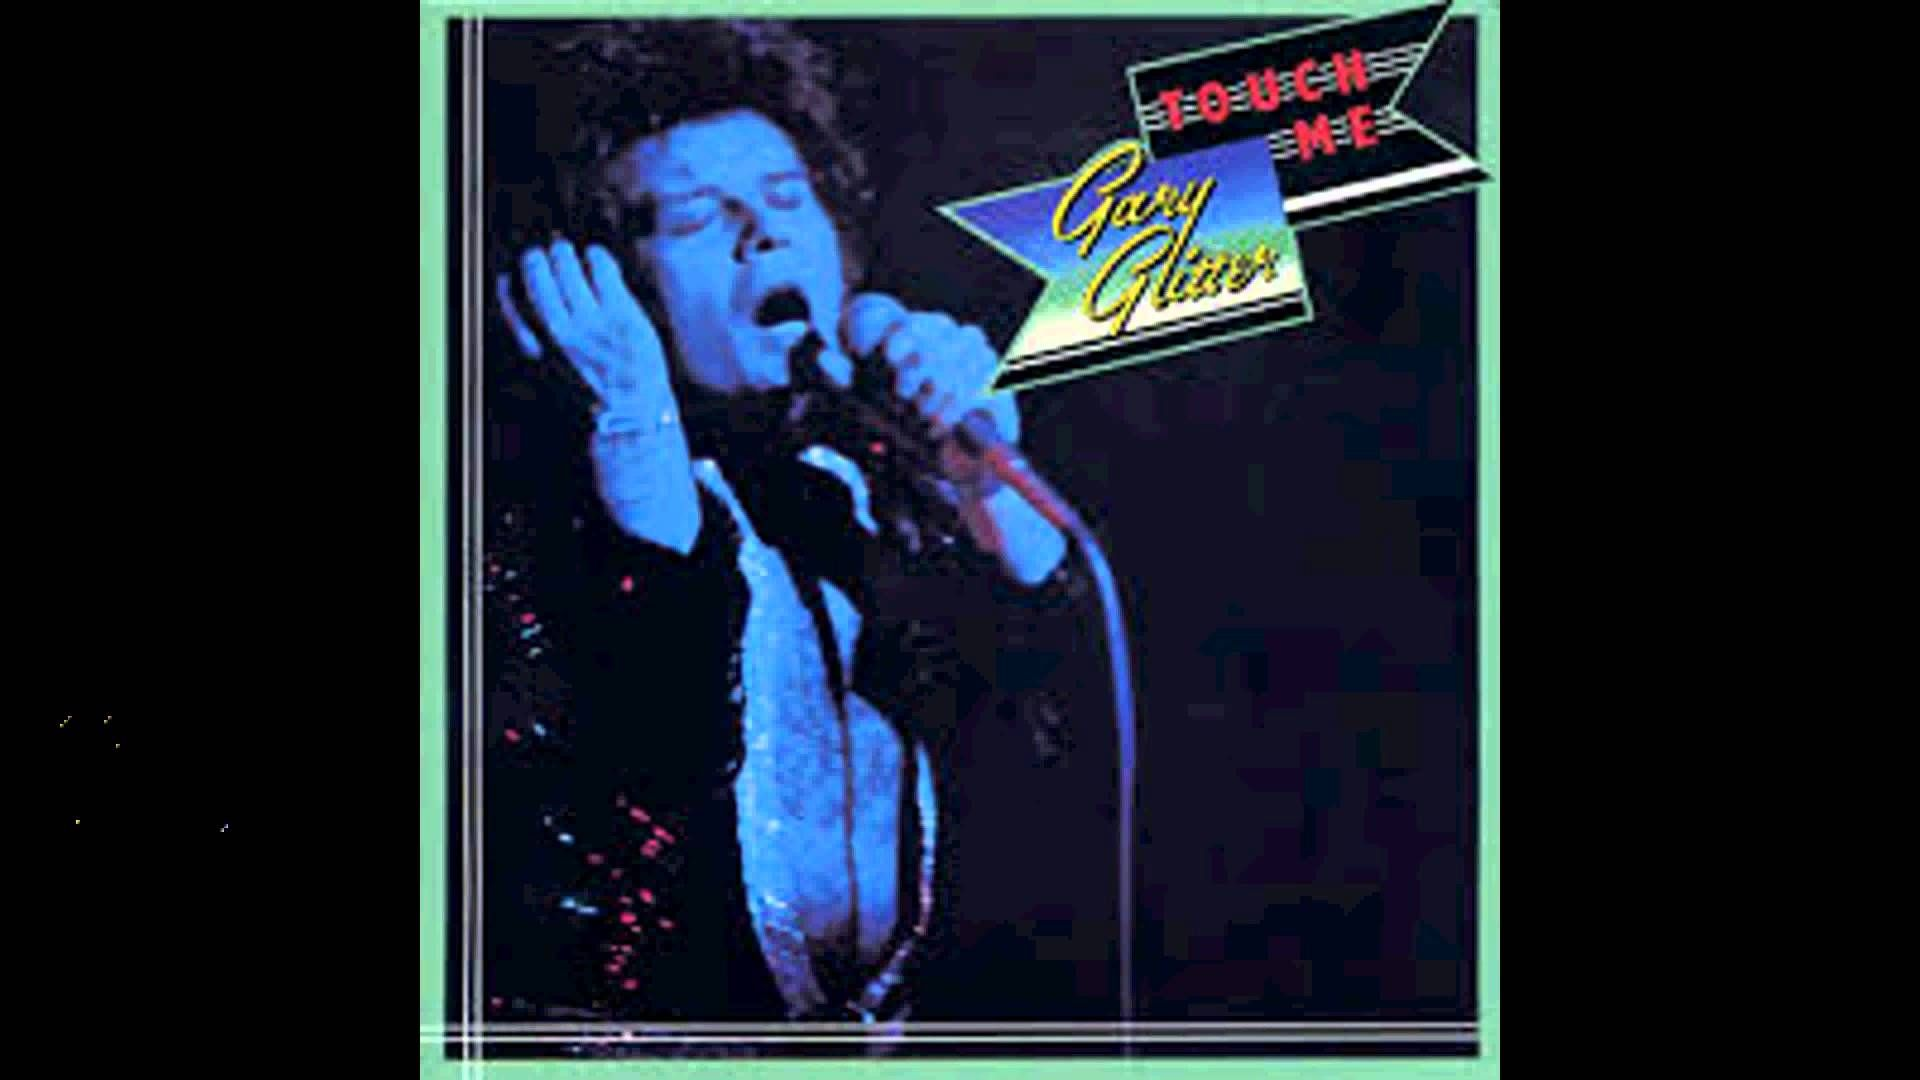 Gary Glitter Touch Me Entire Album Album Rock N Roll Hard Rock